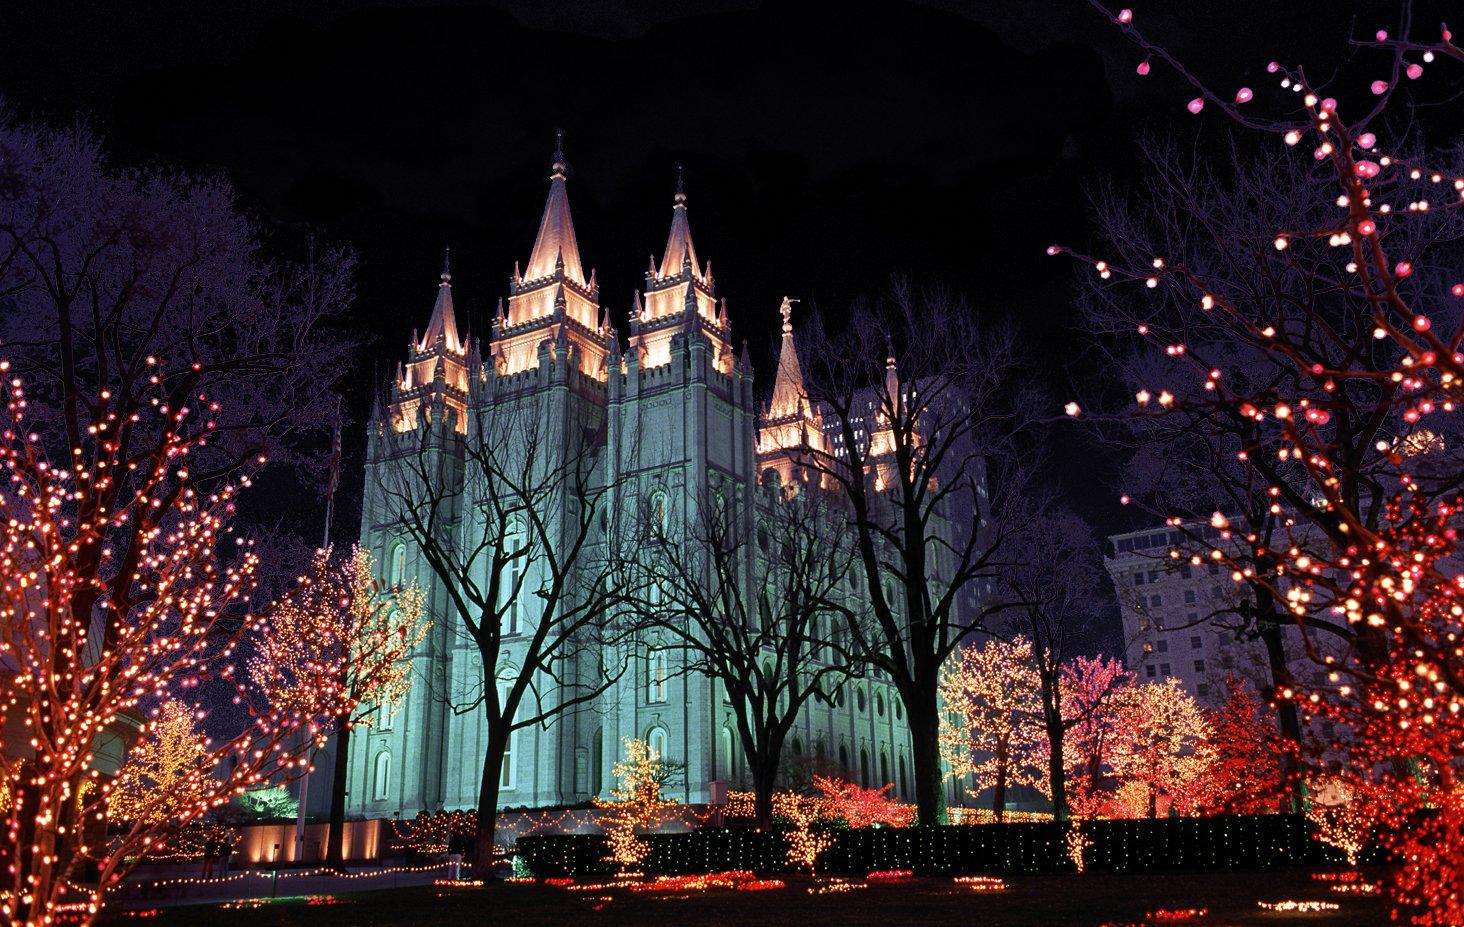 Temple Square in Salt Lake City, Utah via FunkyJunkInteriors.net